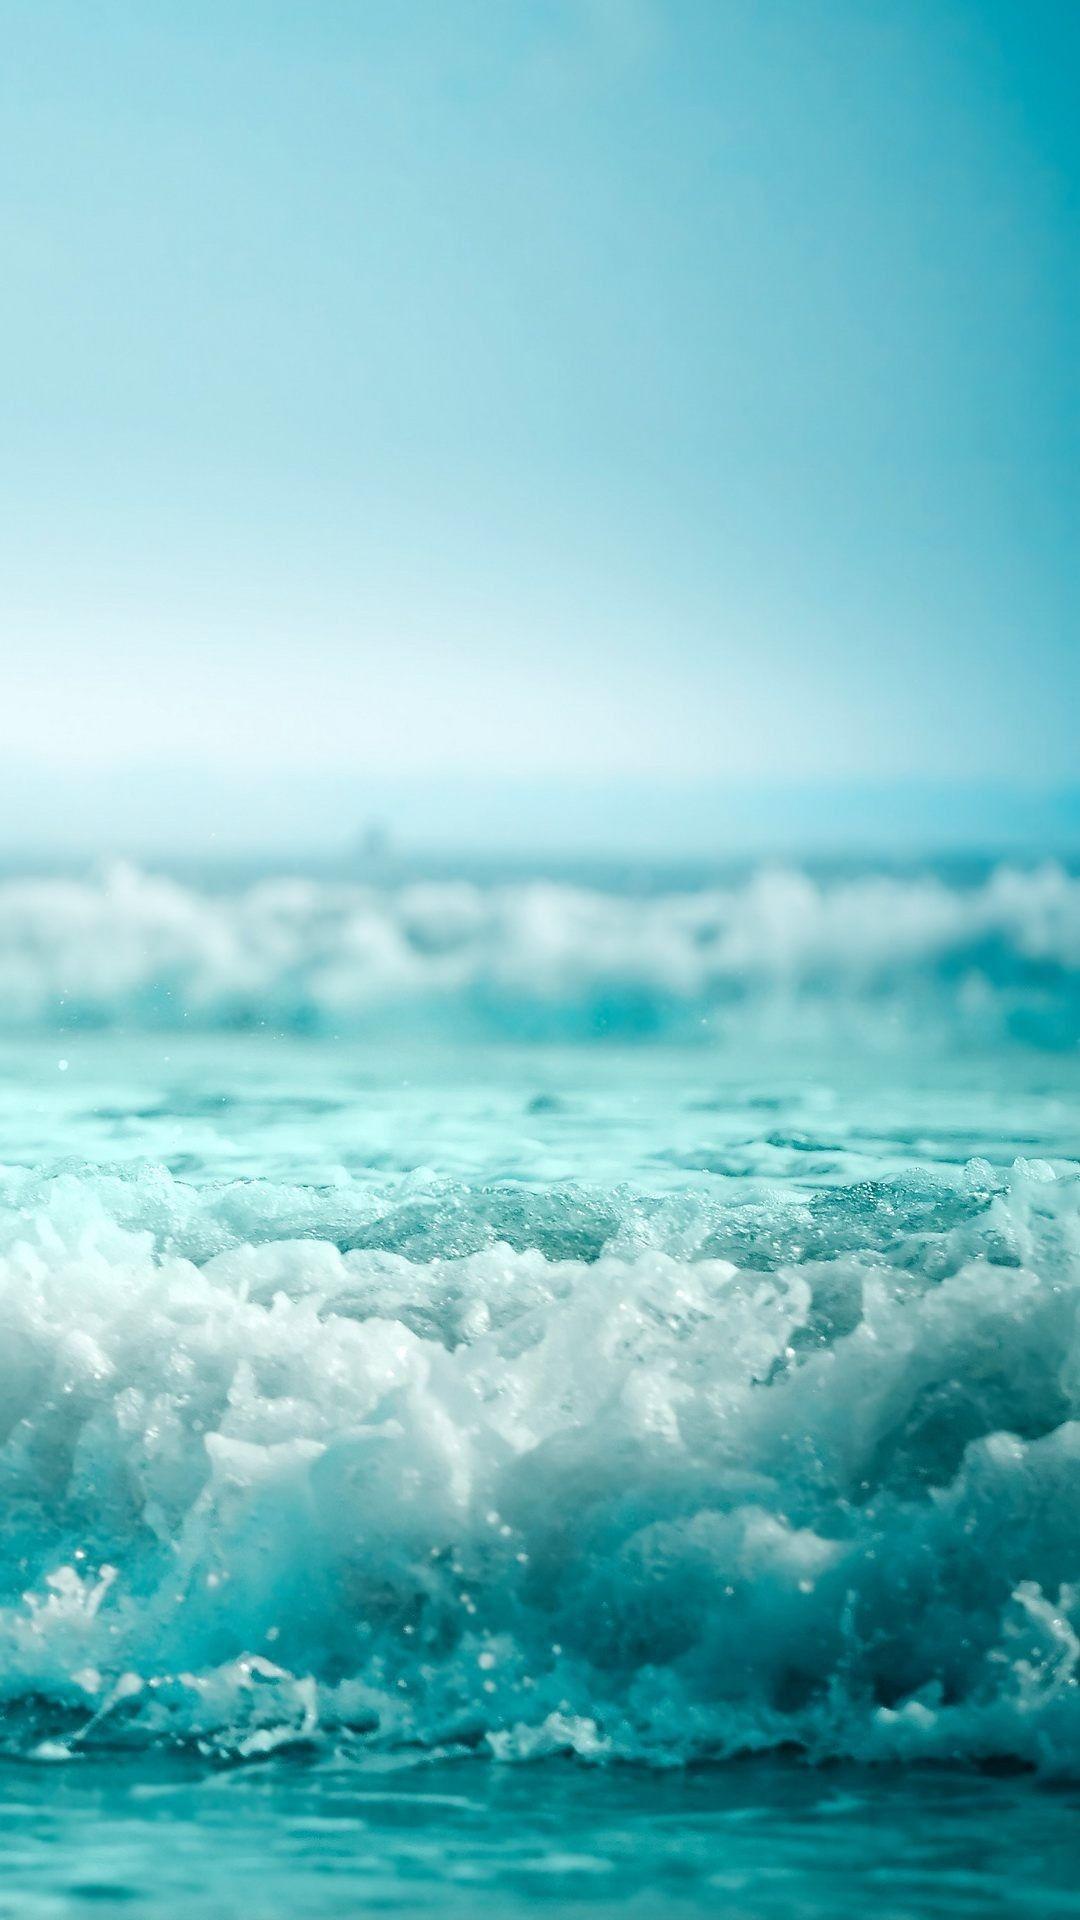 Ocean Wallpapers For Iphone 7 Plus 6